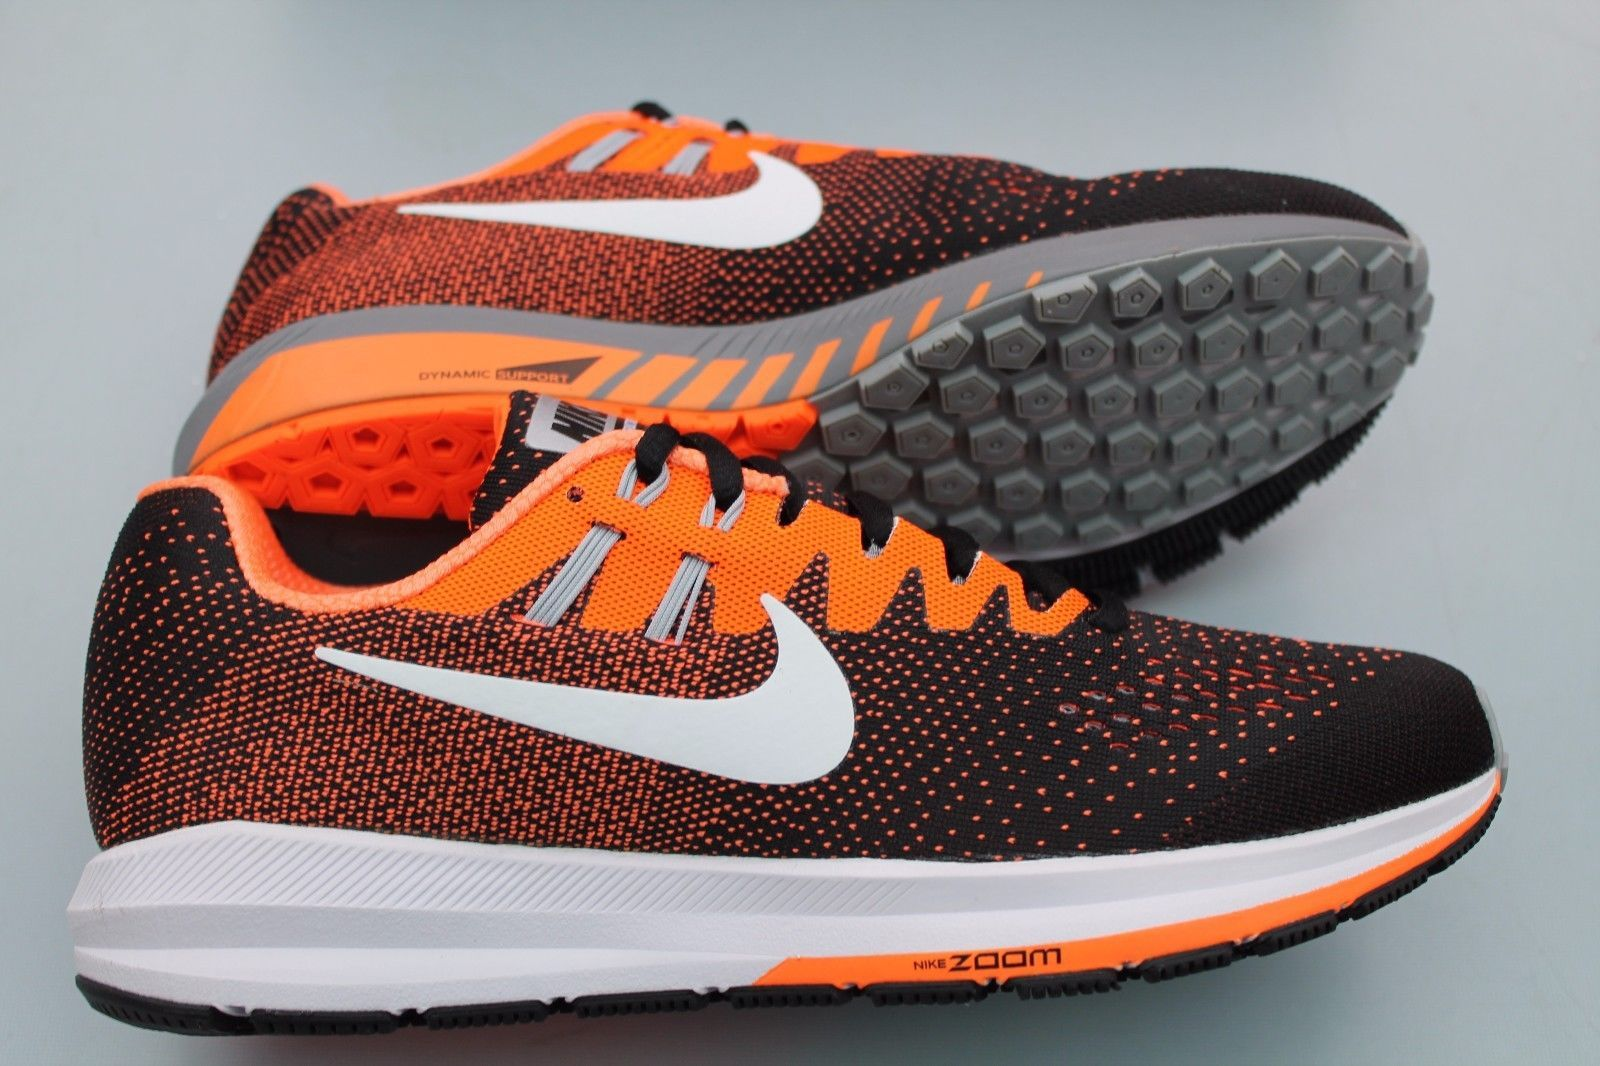 ... nike air zoom structure 20 running trainers black orange 849576 002  rare ...